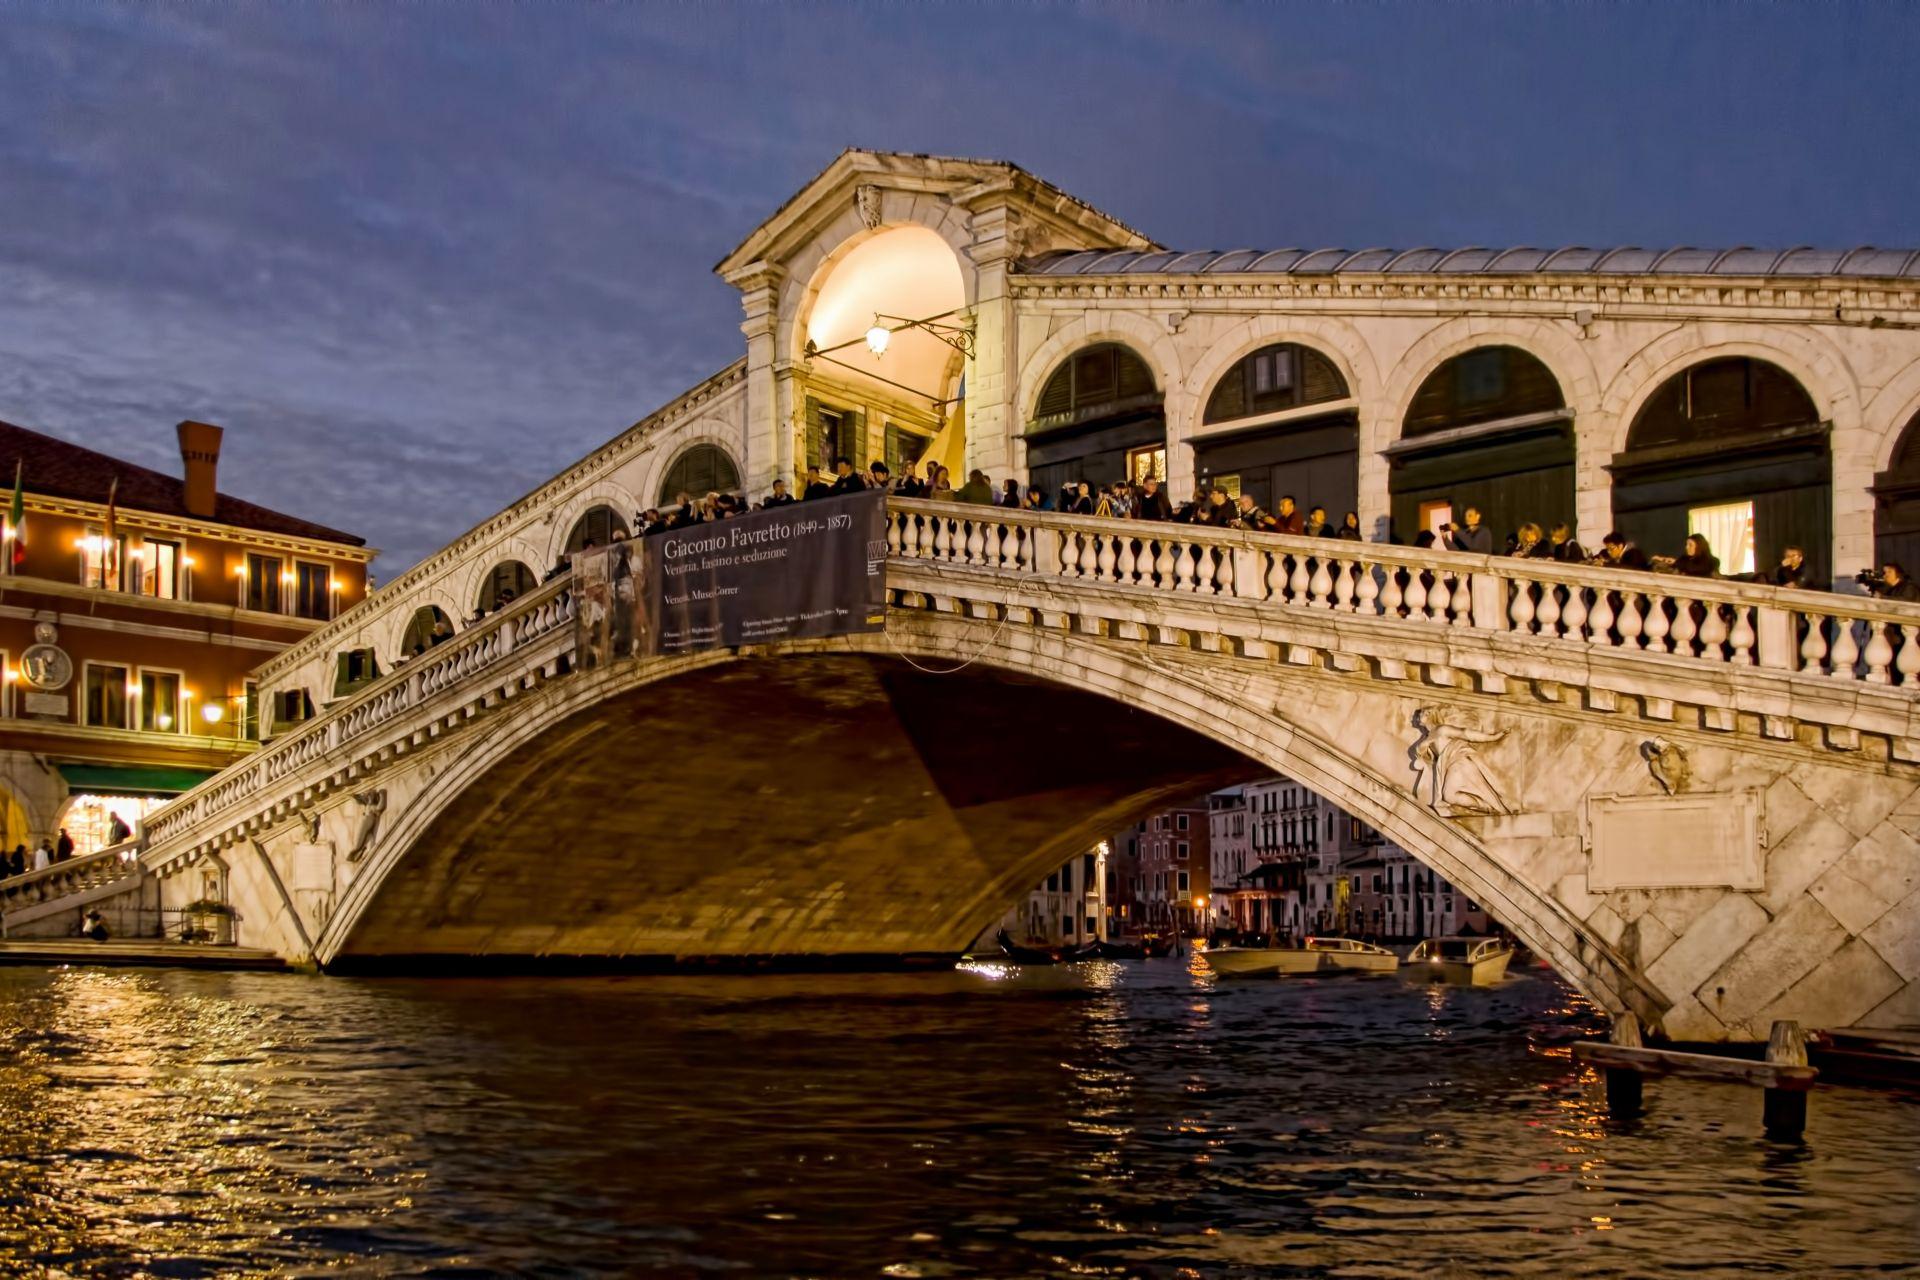 Rialto Bridge in Venice Italy